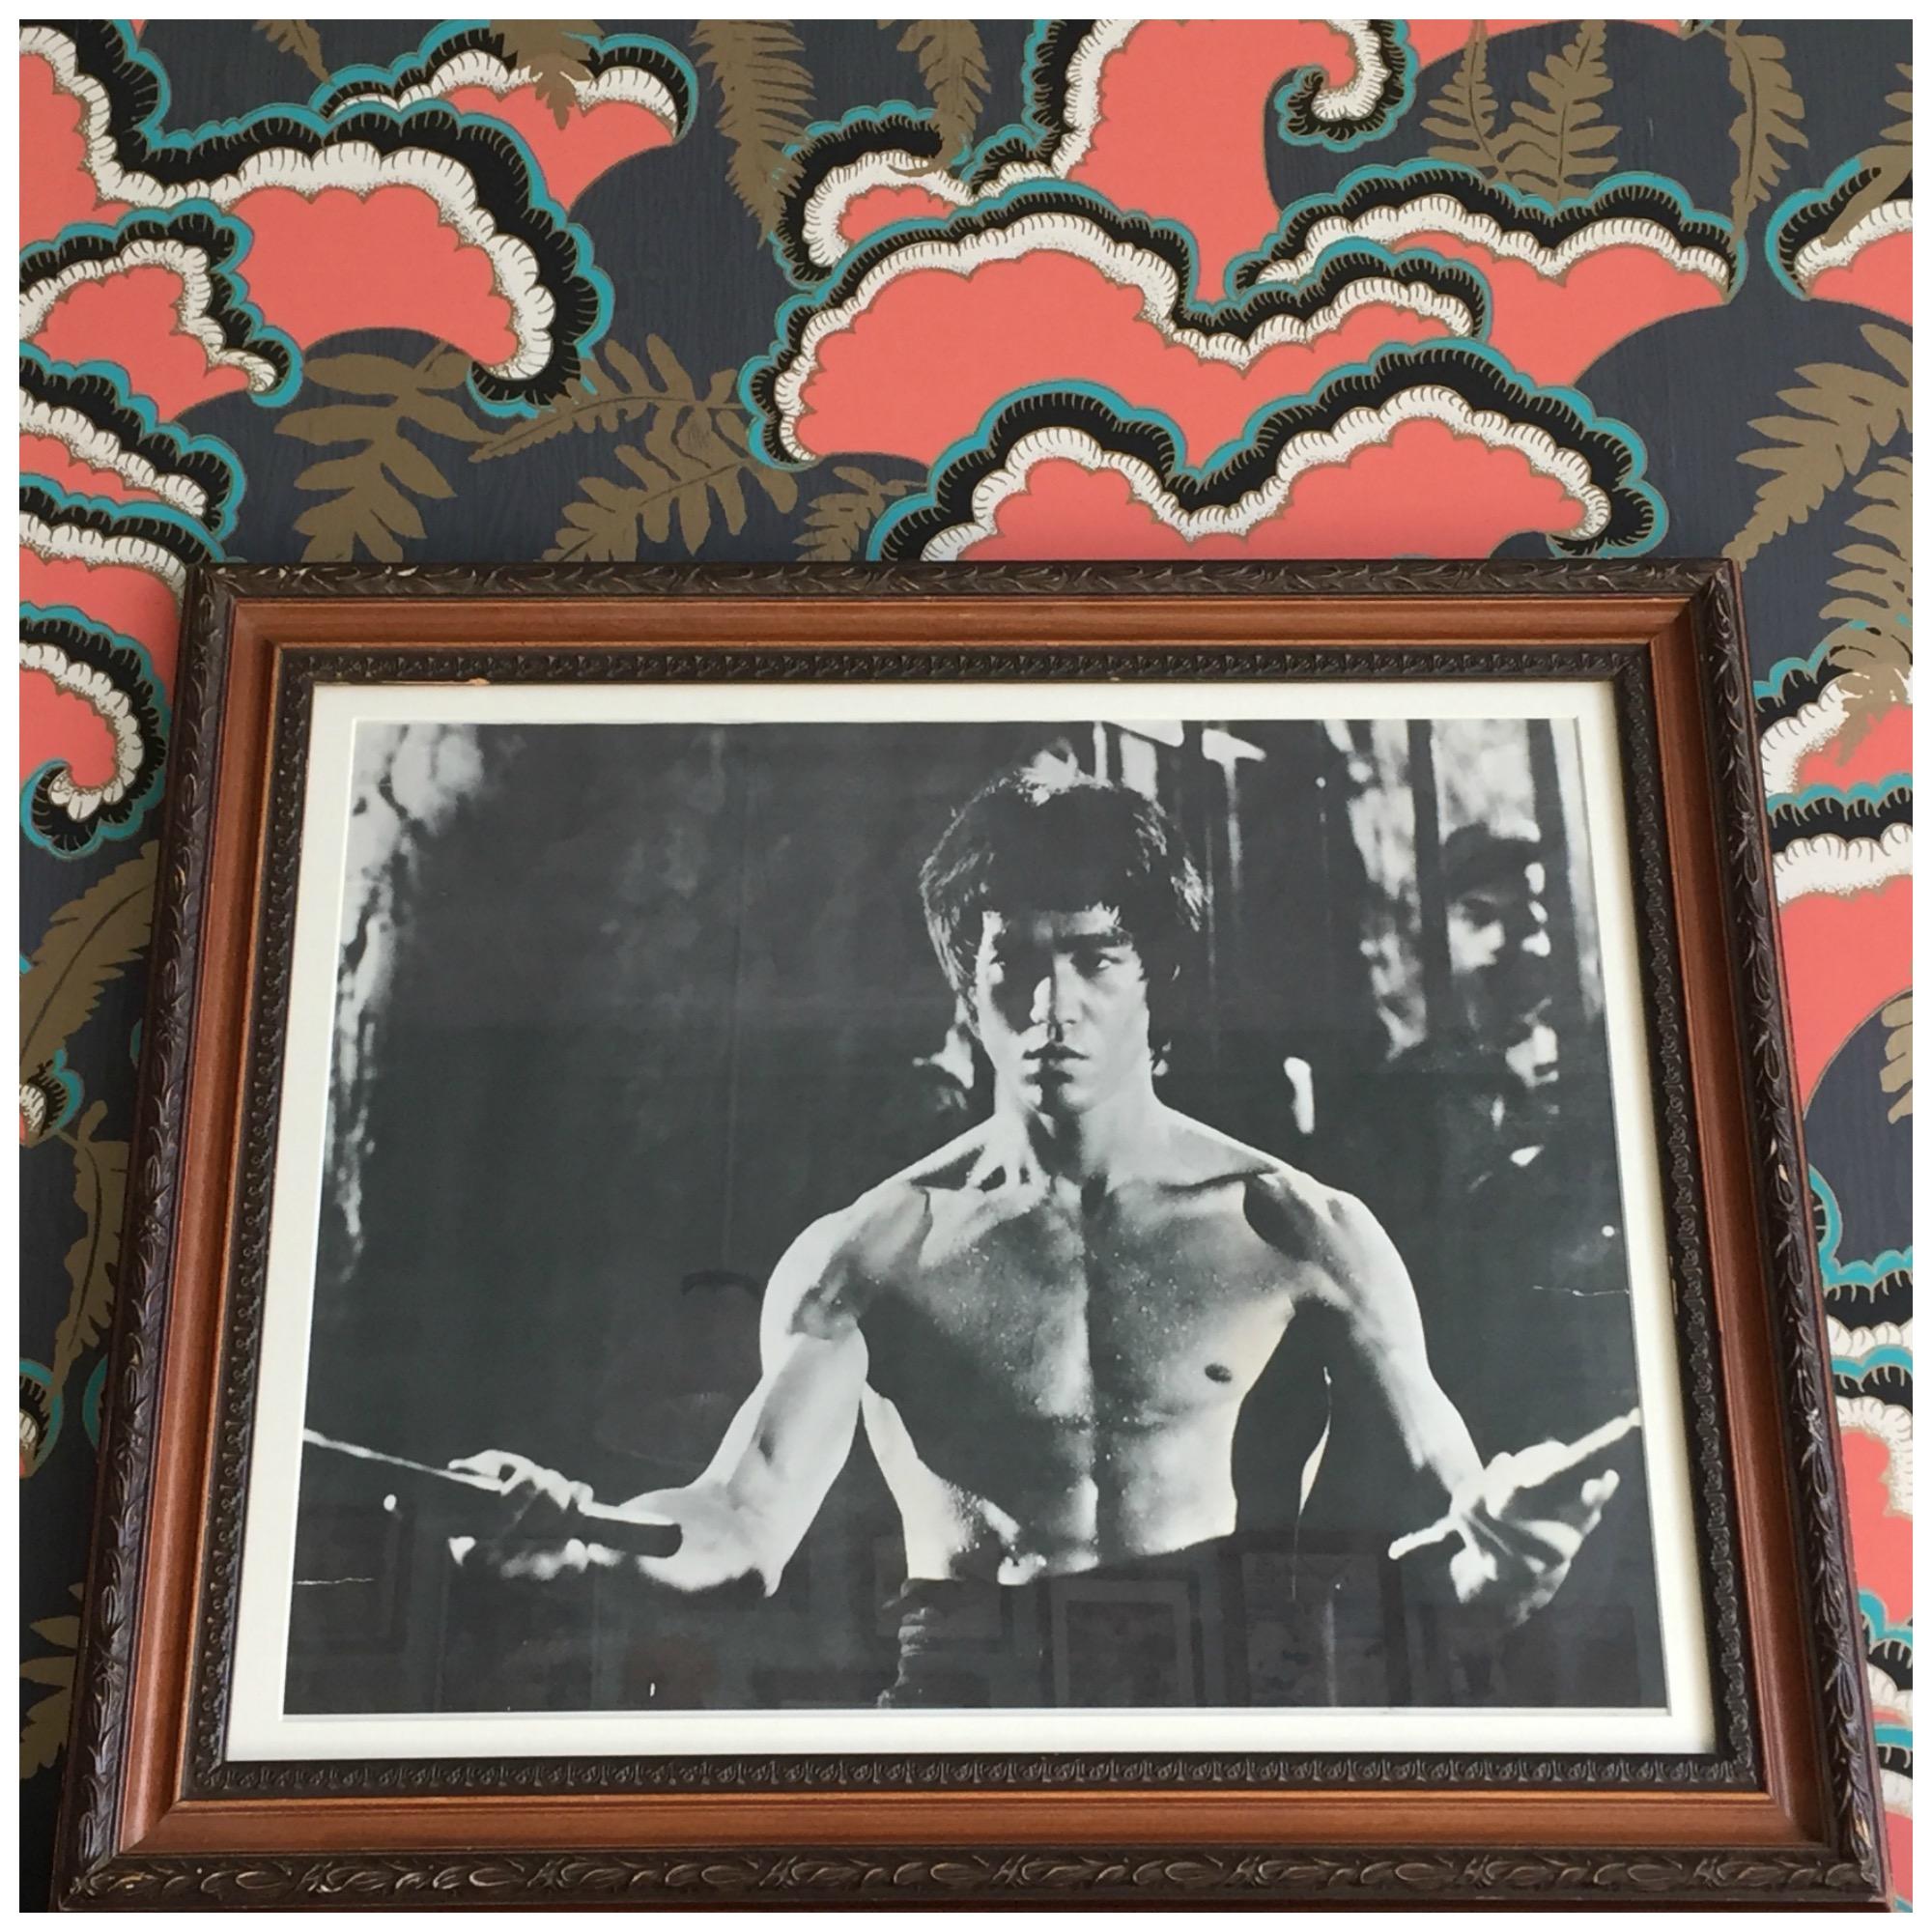 Bruce Lee wallpaper.jpg